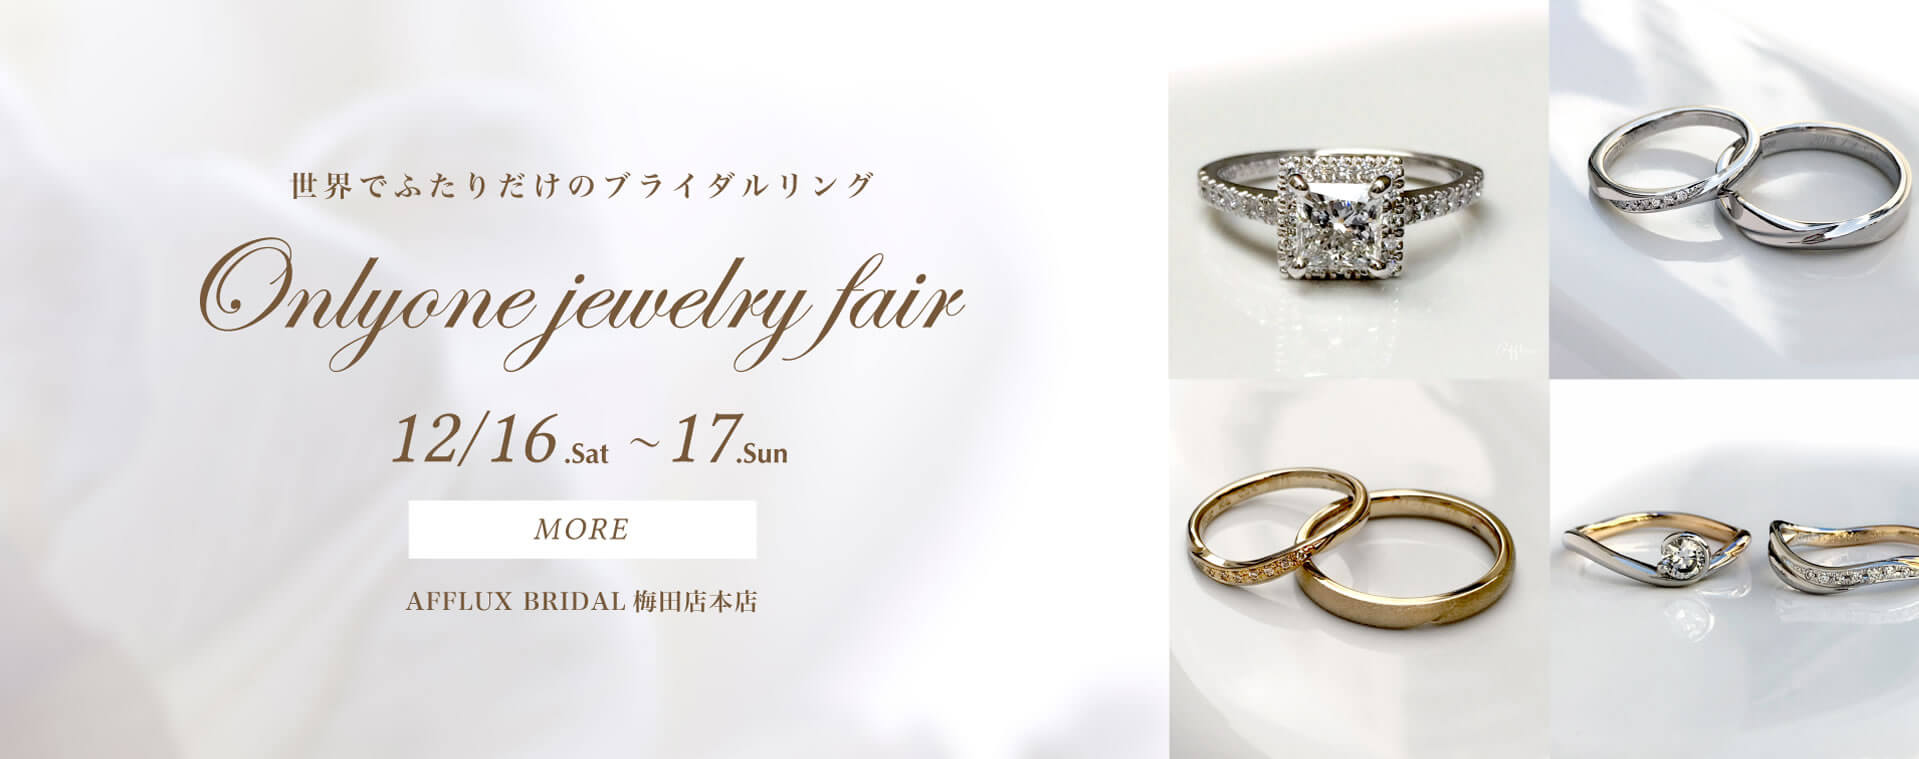 Onlyone jewelry  Fair 12.16-12.17